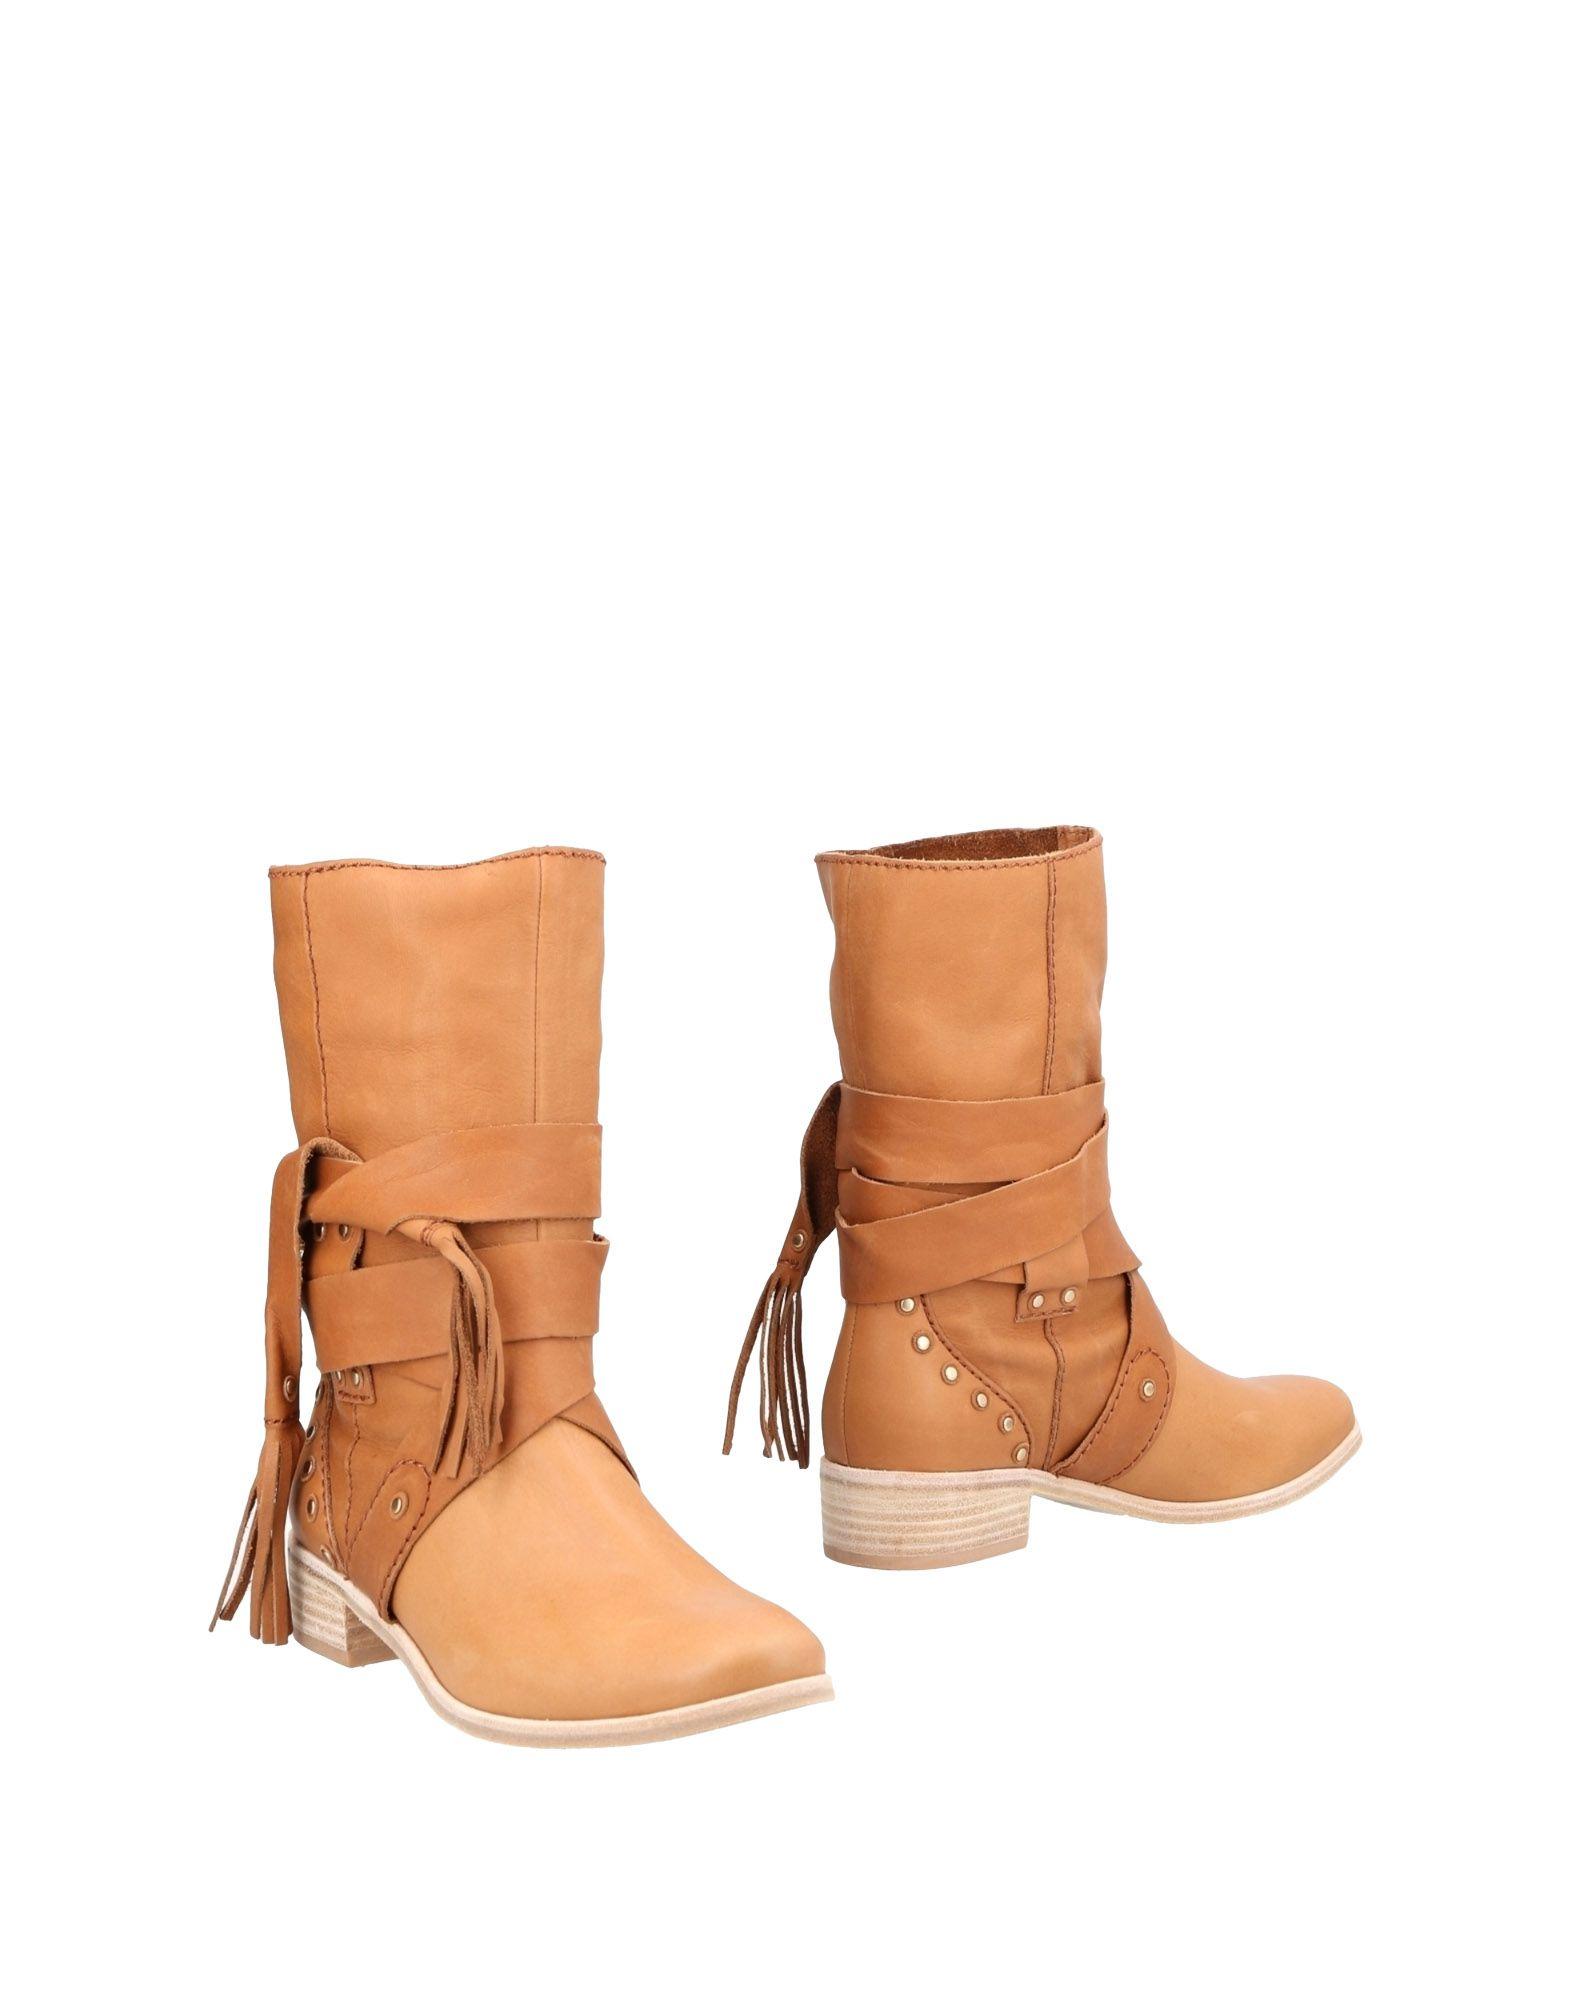 Rabatt Schuhe See By Chloé Stiefelette Damen  11483619AO